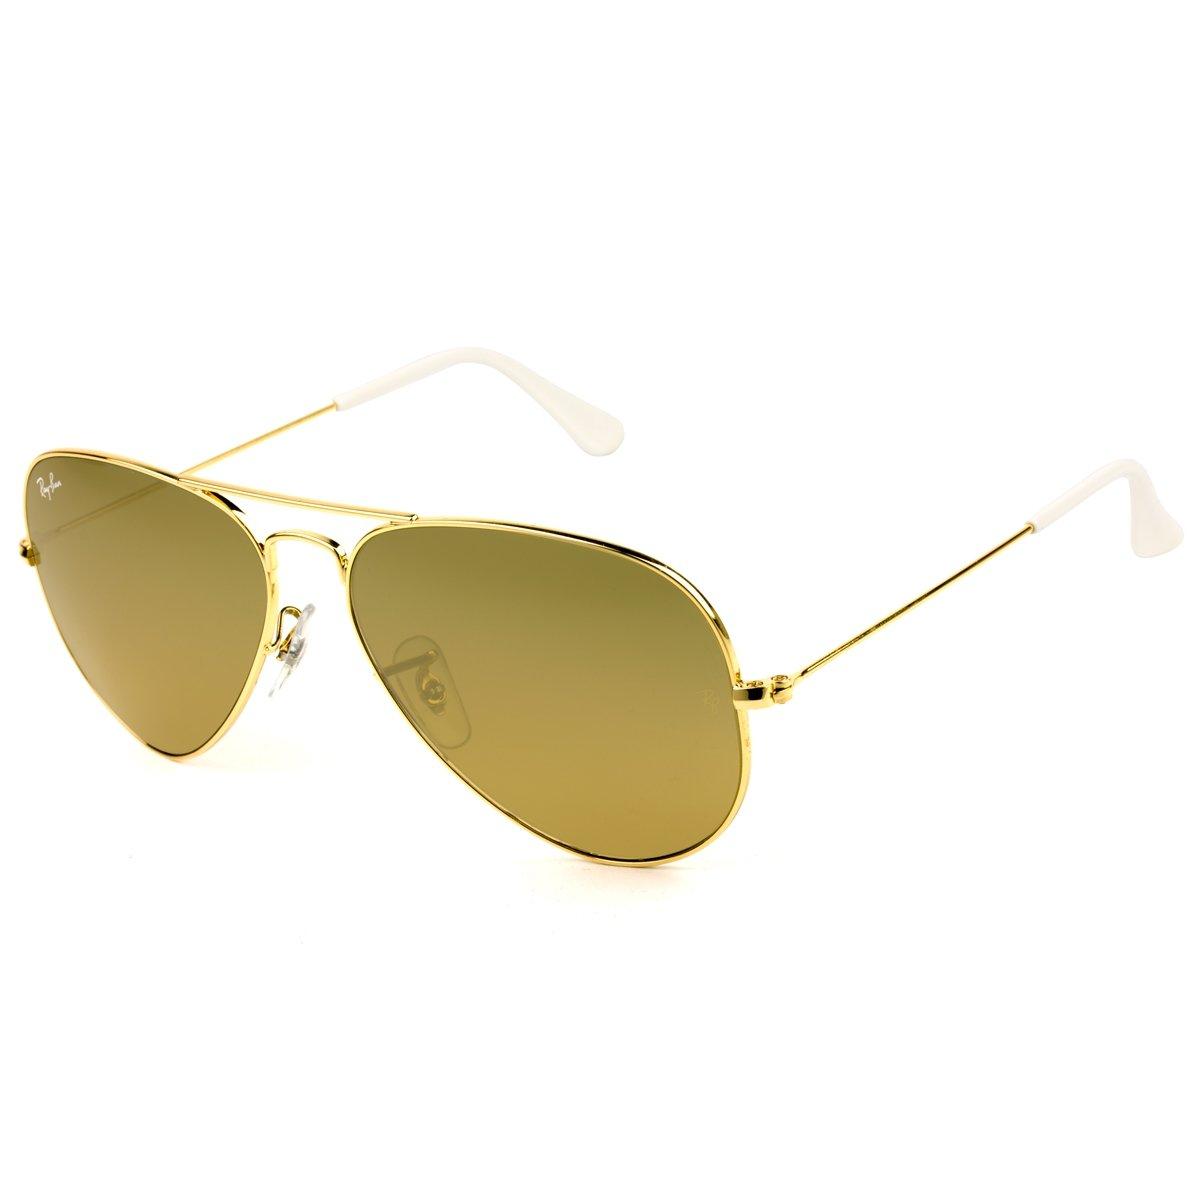 b7cc39aa7d59c Óculos de Sol Feminino Ray Ban   Óculos de Sol Ray Ban Aviador ...